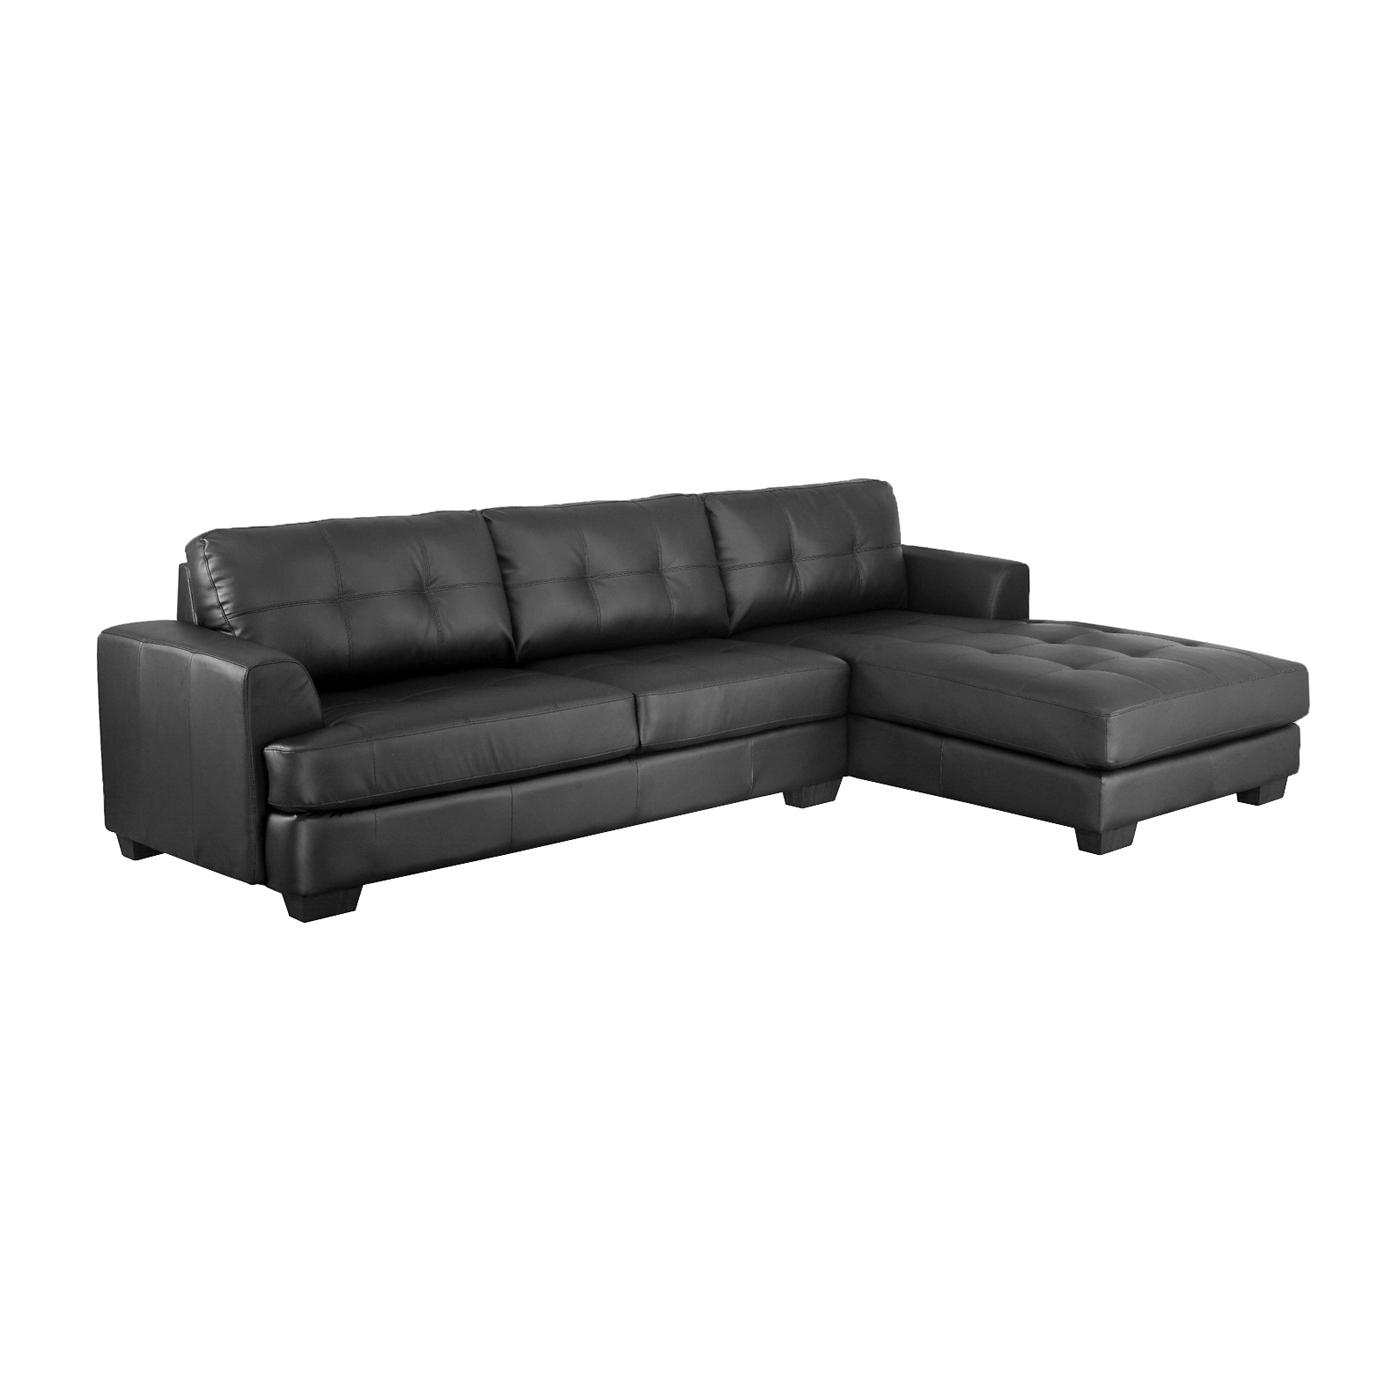 baxton studio dobson leather modern sectional sofa furniture village co uk sofas chairs ideas